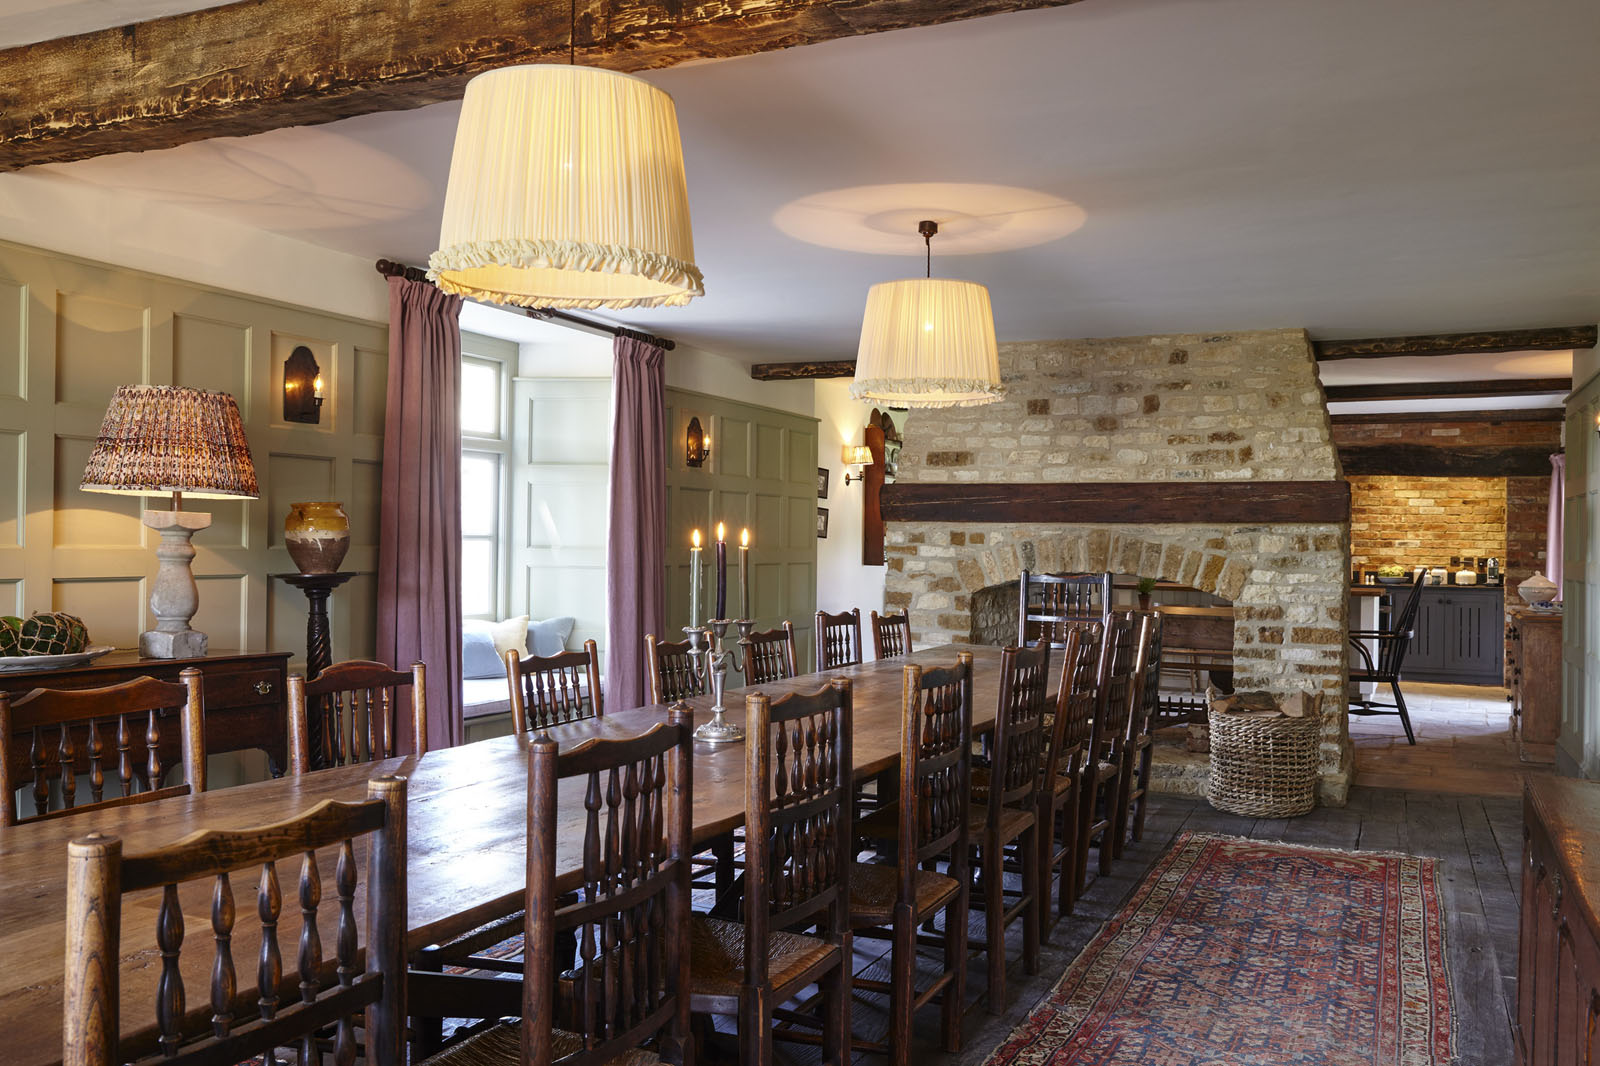 Farmhouse Rustic Kitchen